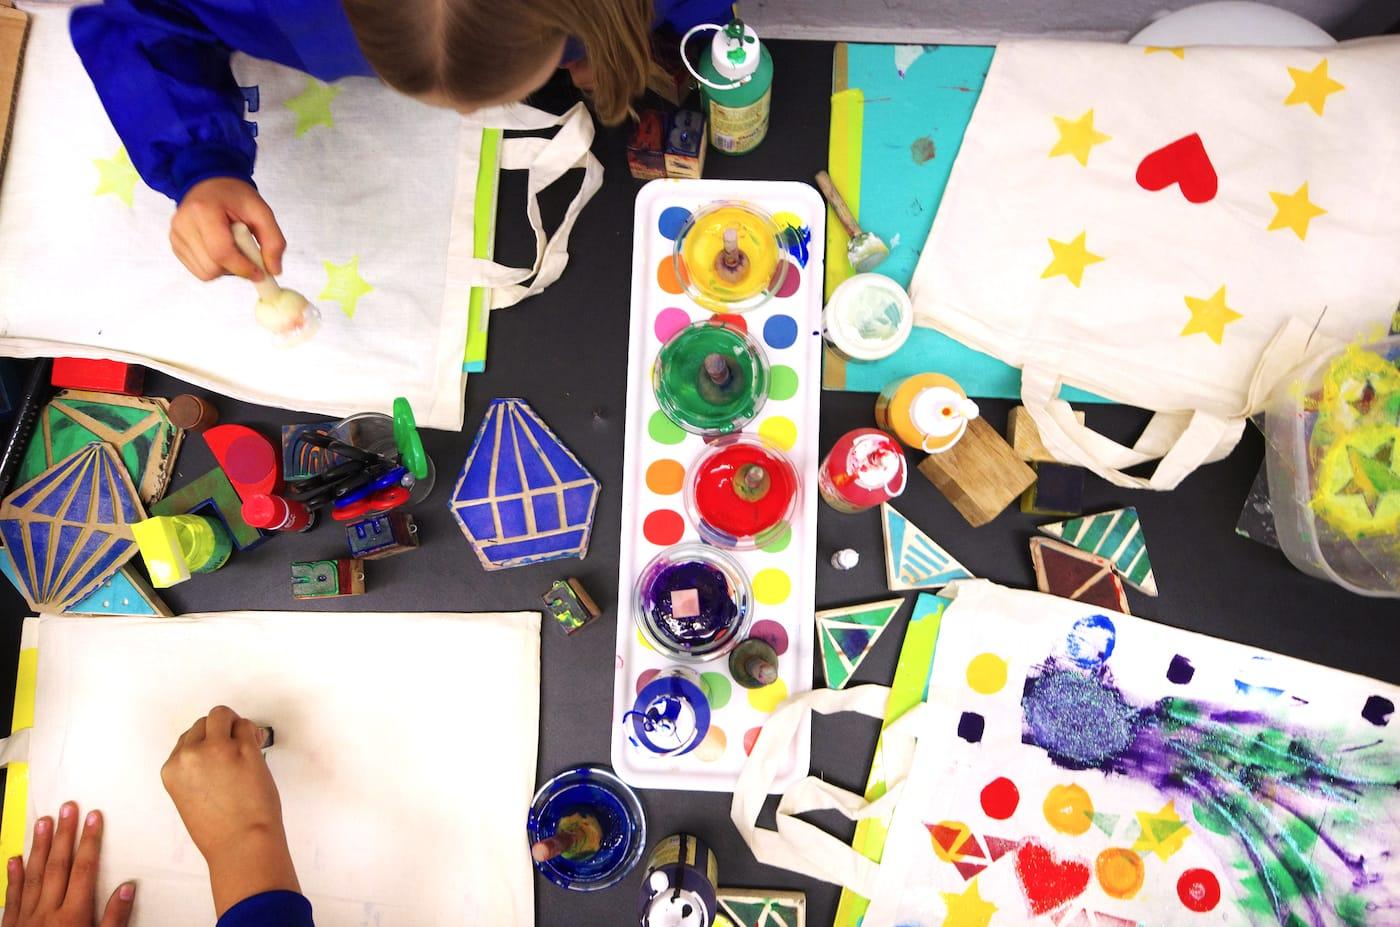 kreativ Kindergeburtstag feiern in Berlin im Grundschulalter bei Krumulus // HIMBEER